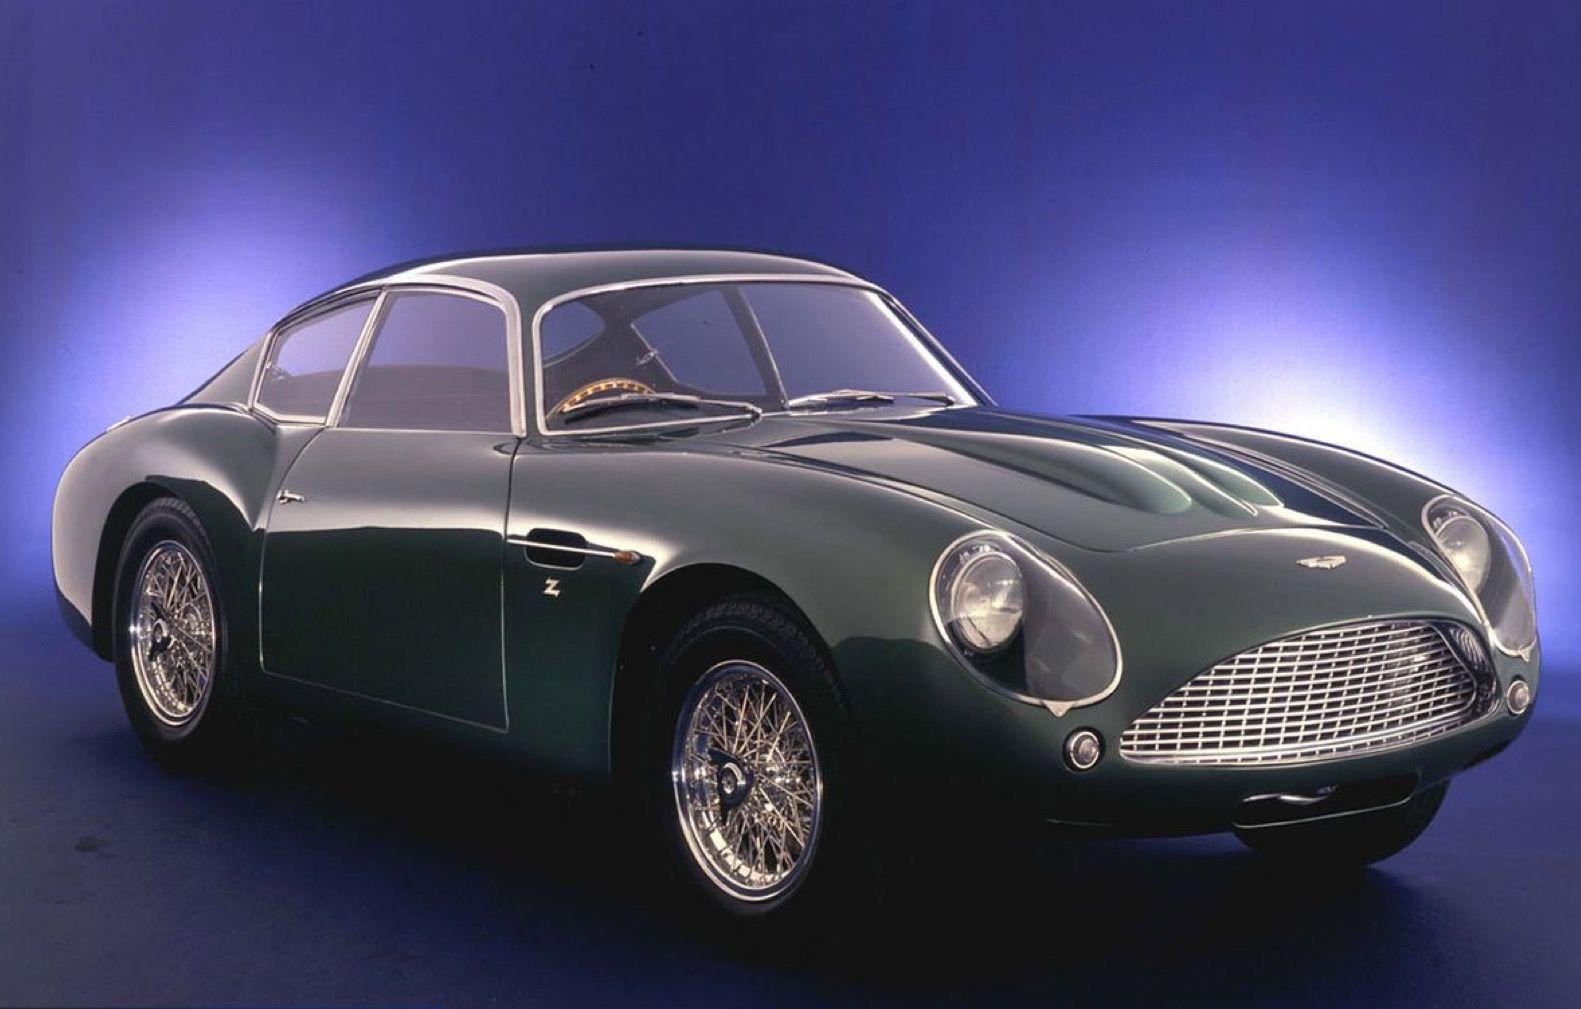 1959 Aston Martin Db4 Gt Zagato Aston Martin Sports Car Aston Martin Db4 Aston Martin